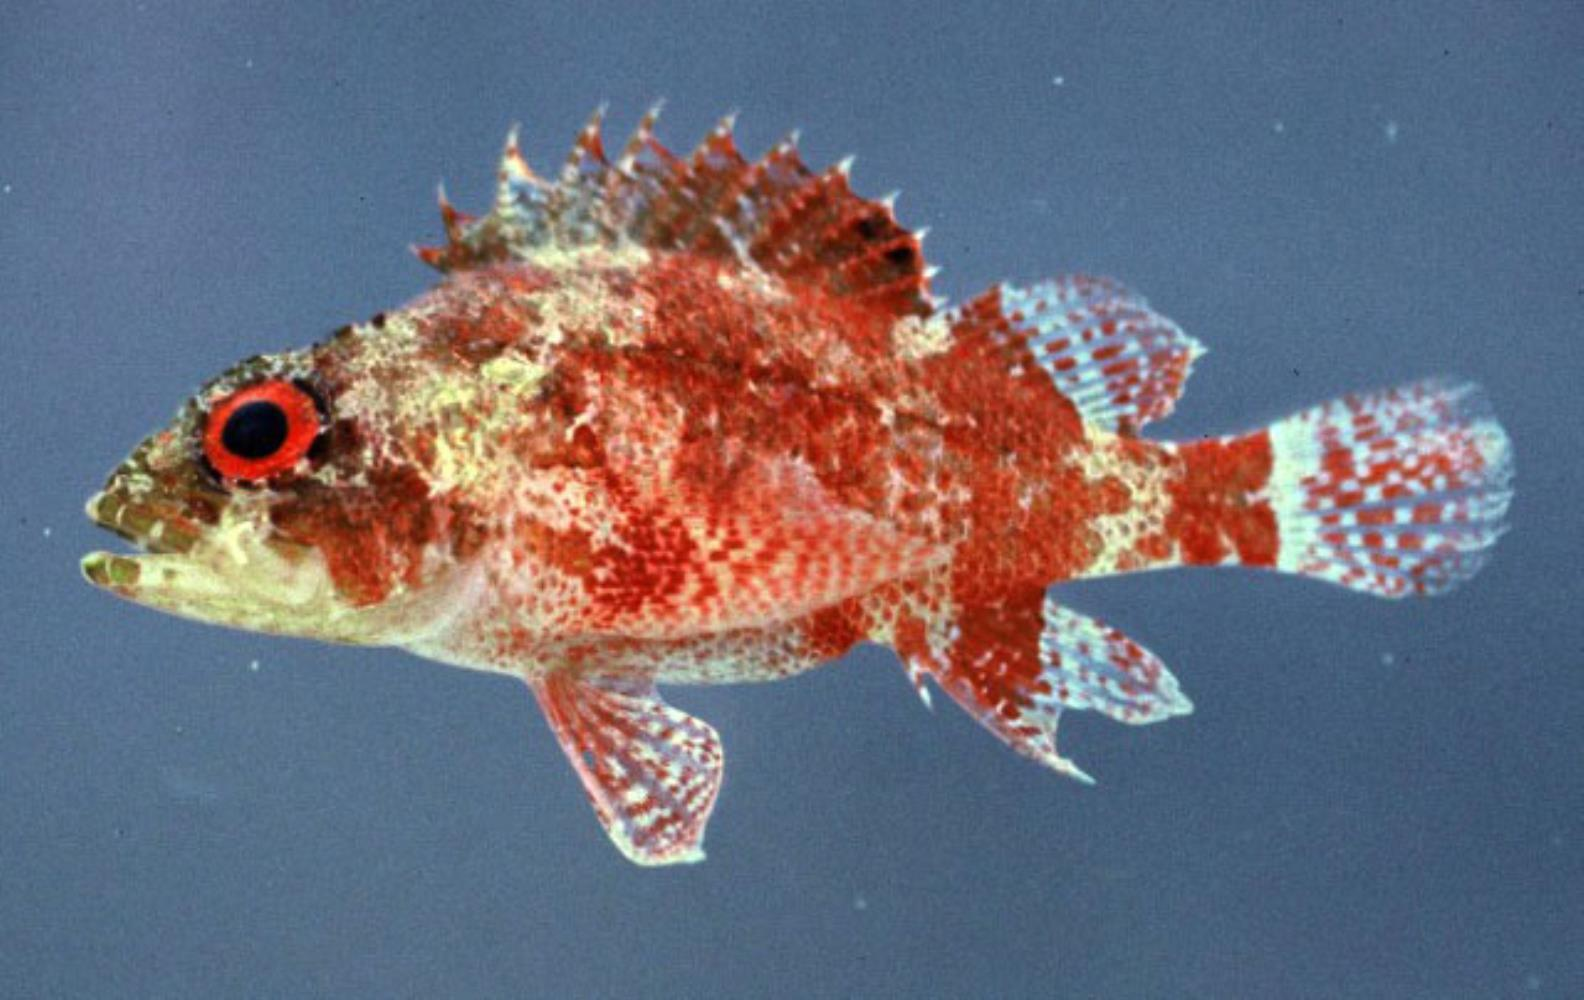 Deepreef Scorpionfish